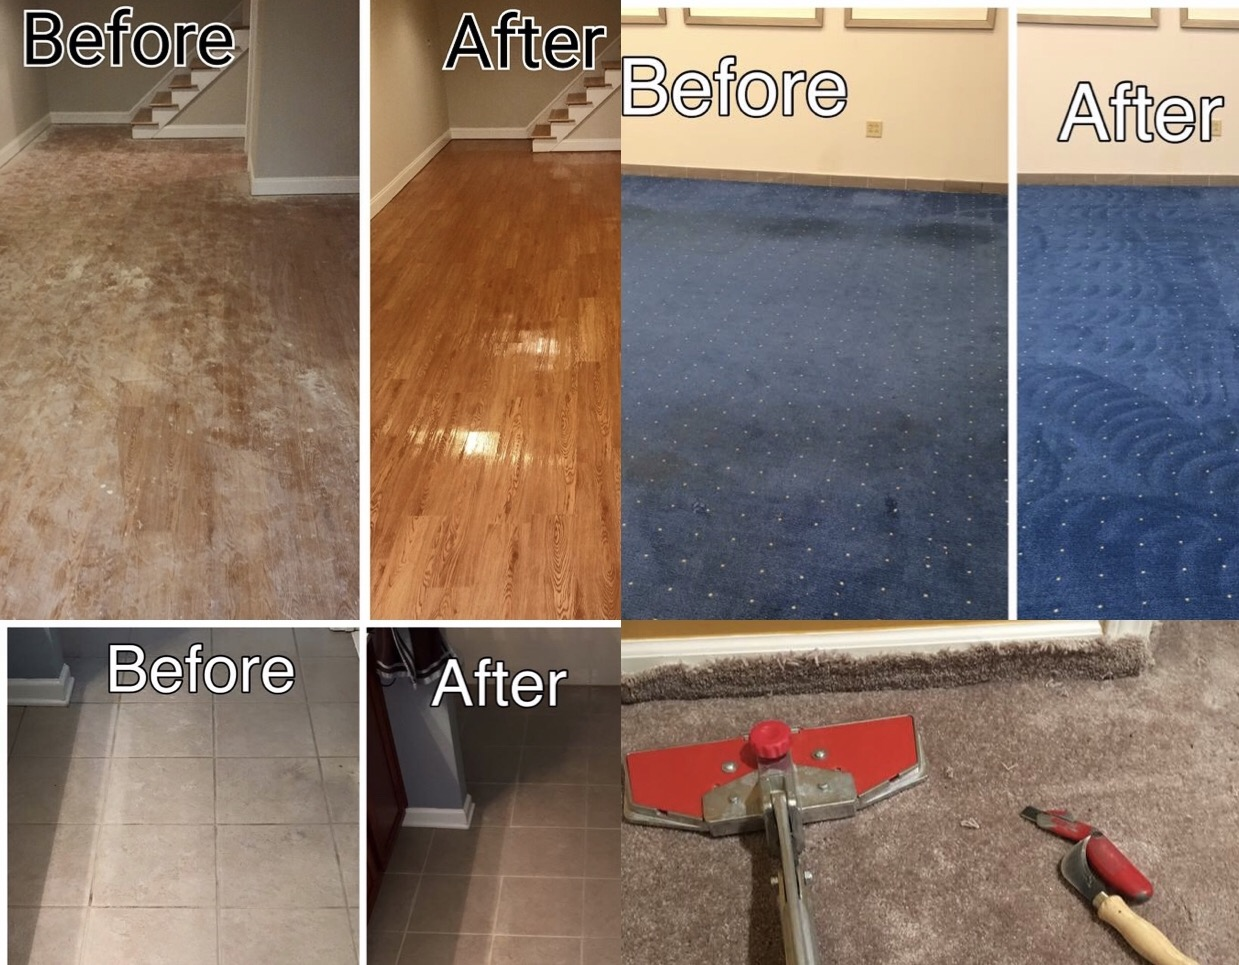 Kg Cleaning Service Inc 30 Park Rd Ste 200 Dawsonville Ga 30534 Yp